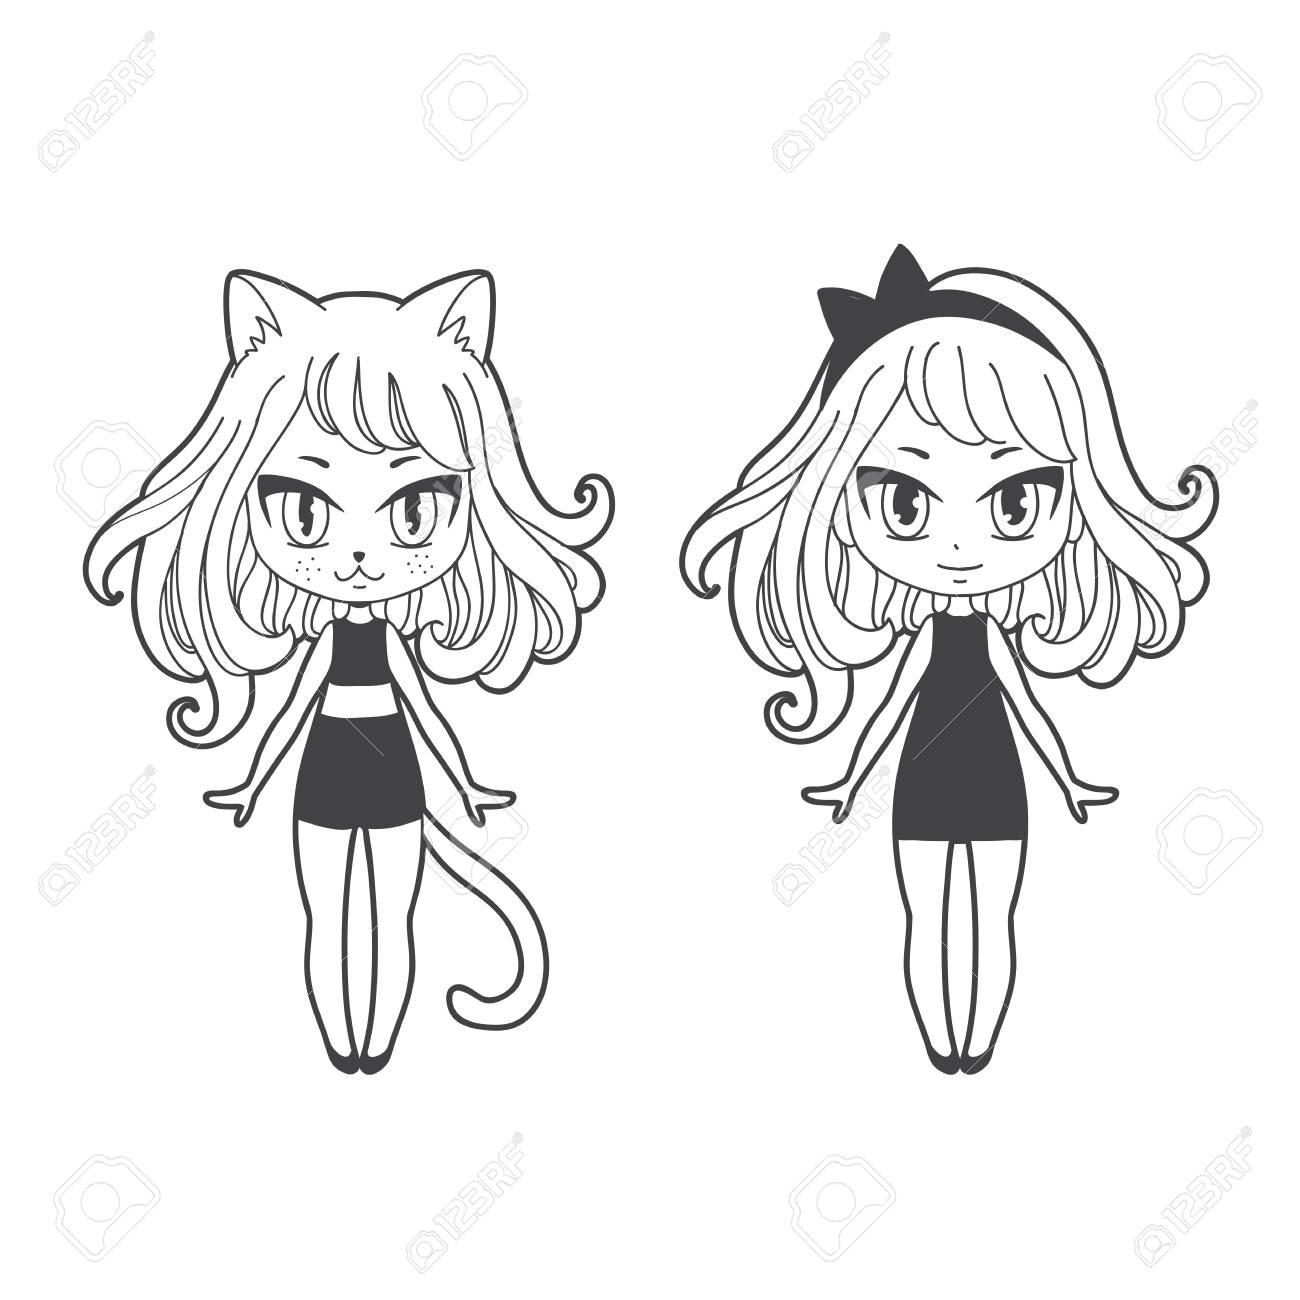 Cute Vector Illustration Kawaii Anime Girl Cat Big Eyes Use